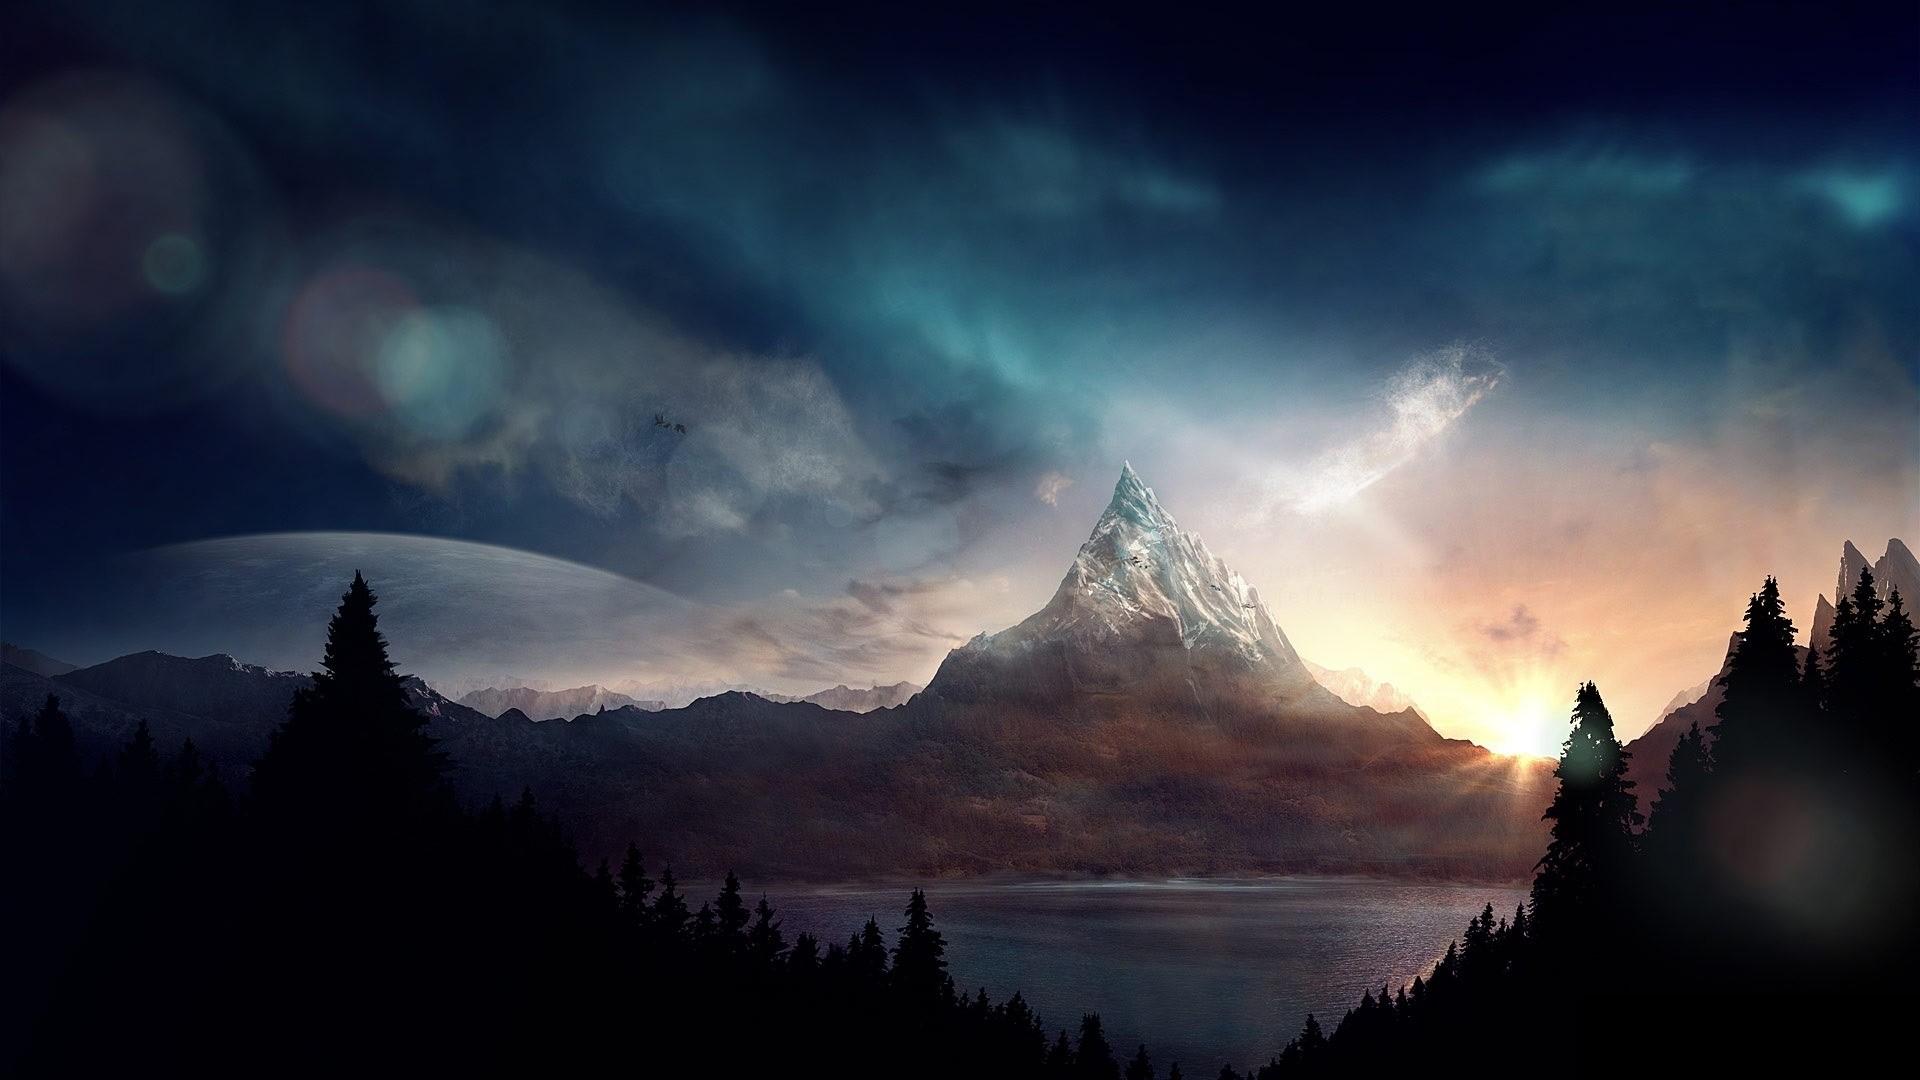 … Background Full HD 1080p. Wallpaper peak, mountain, fantasy,  art